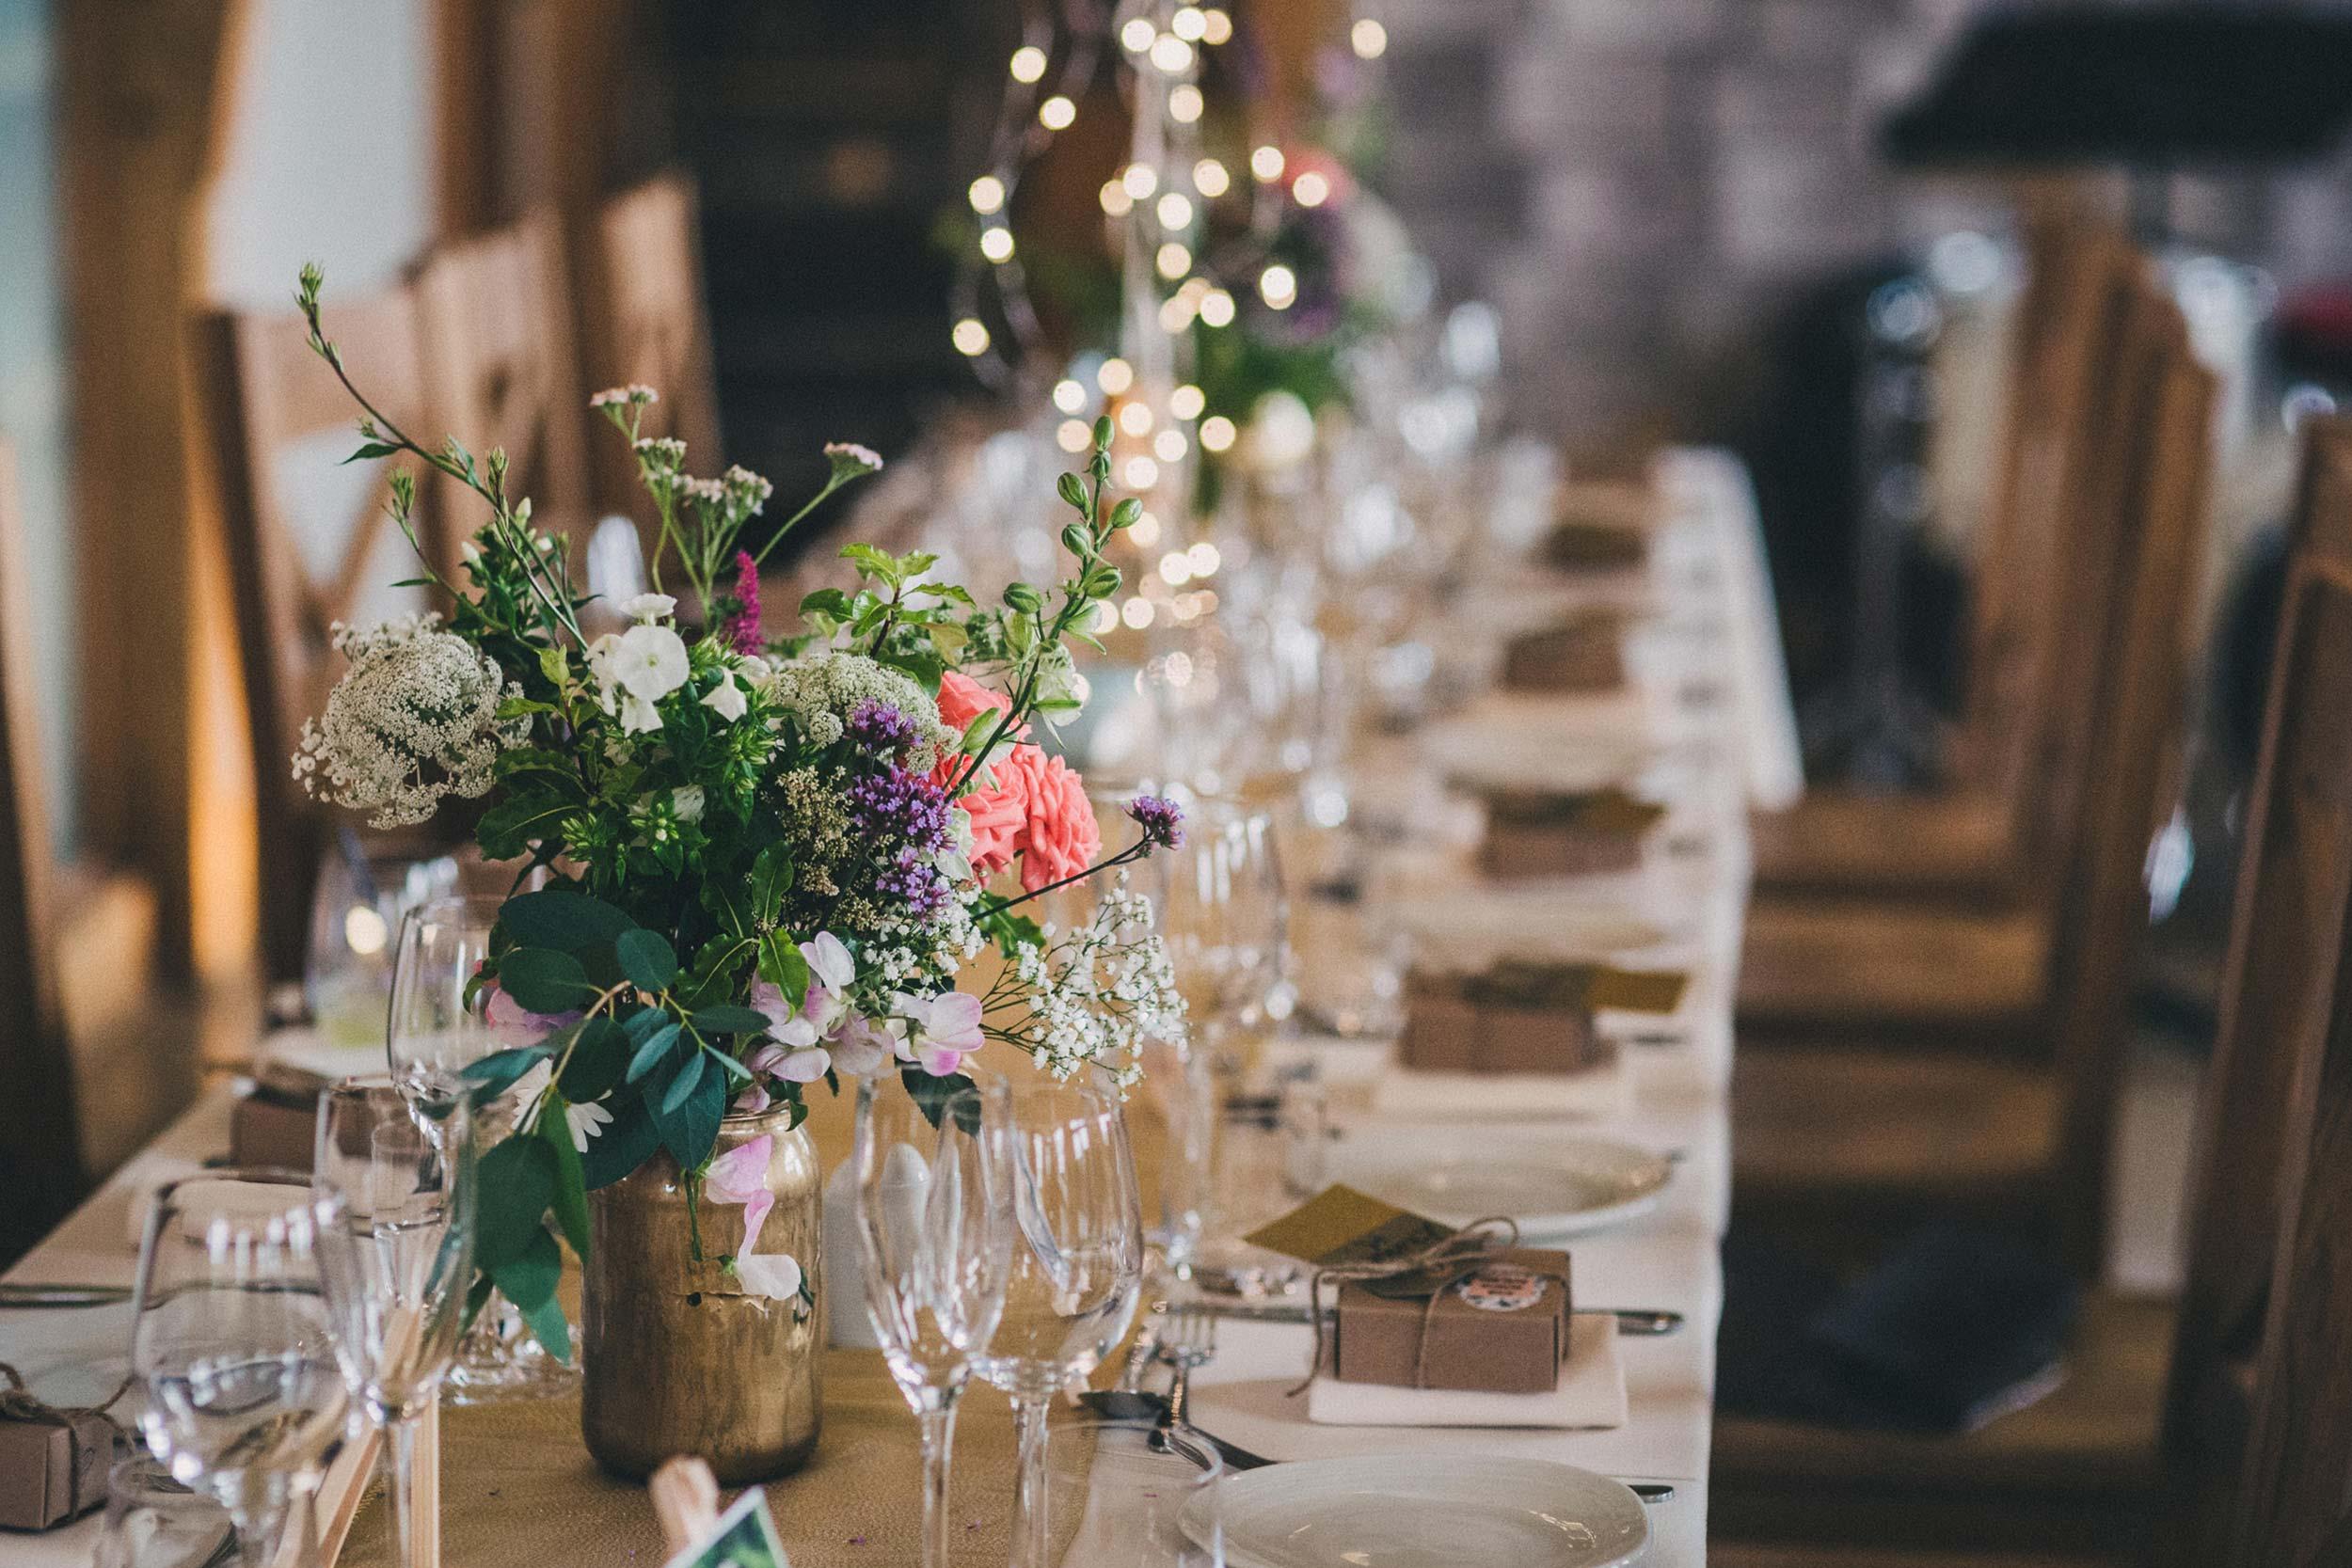 Colourful wedding flower decor for a same-sex wedding; Claire Penn photography